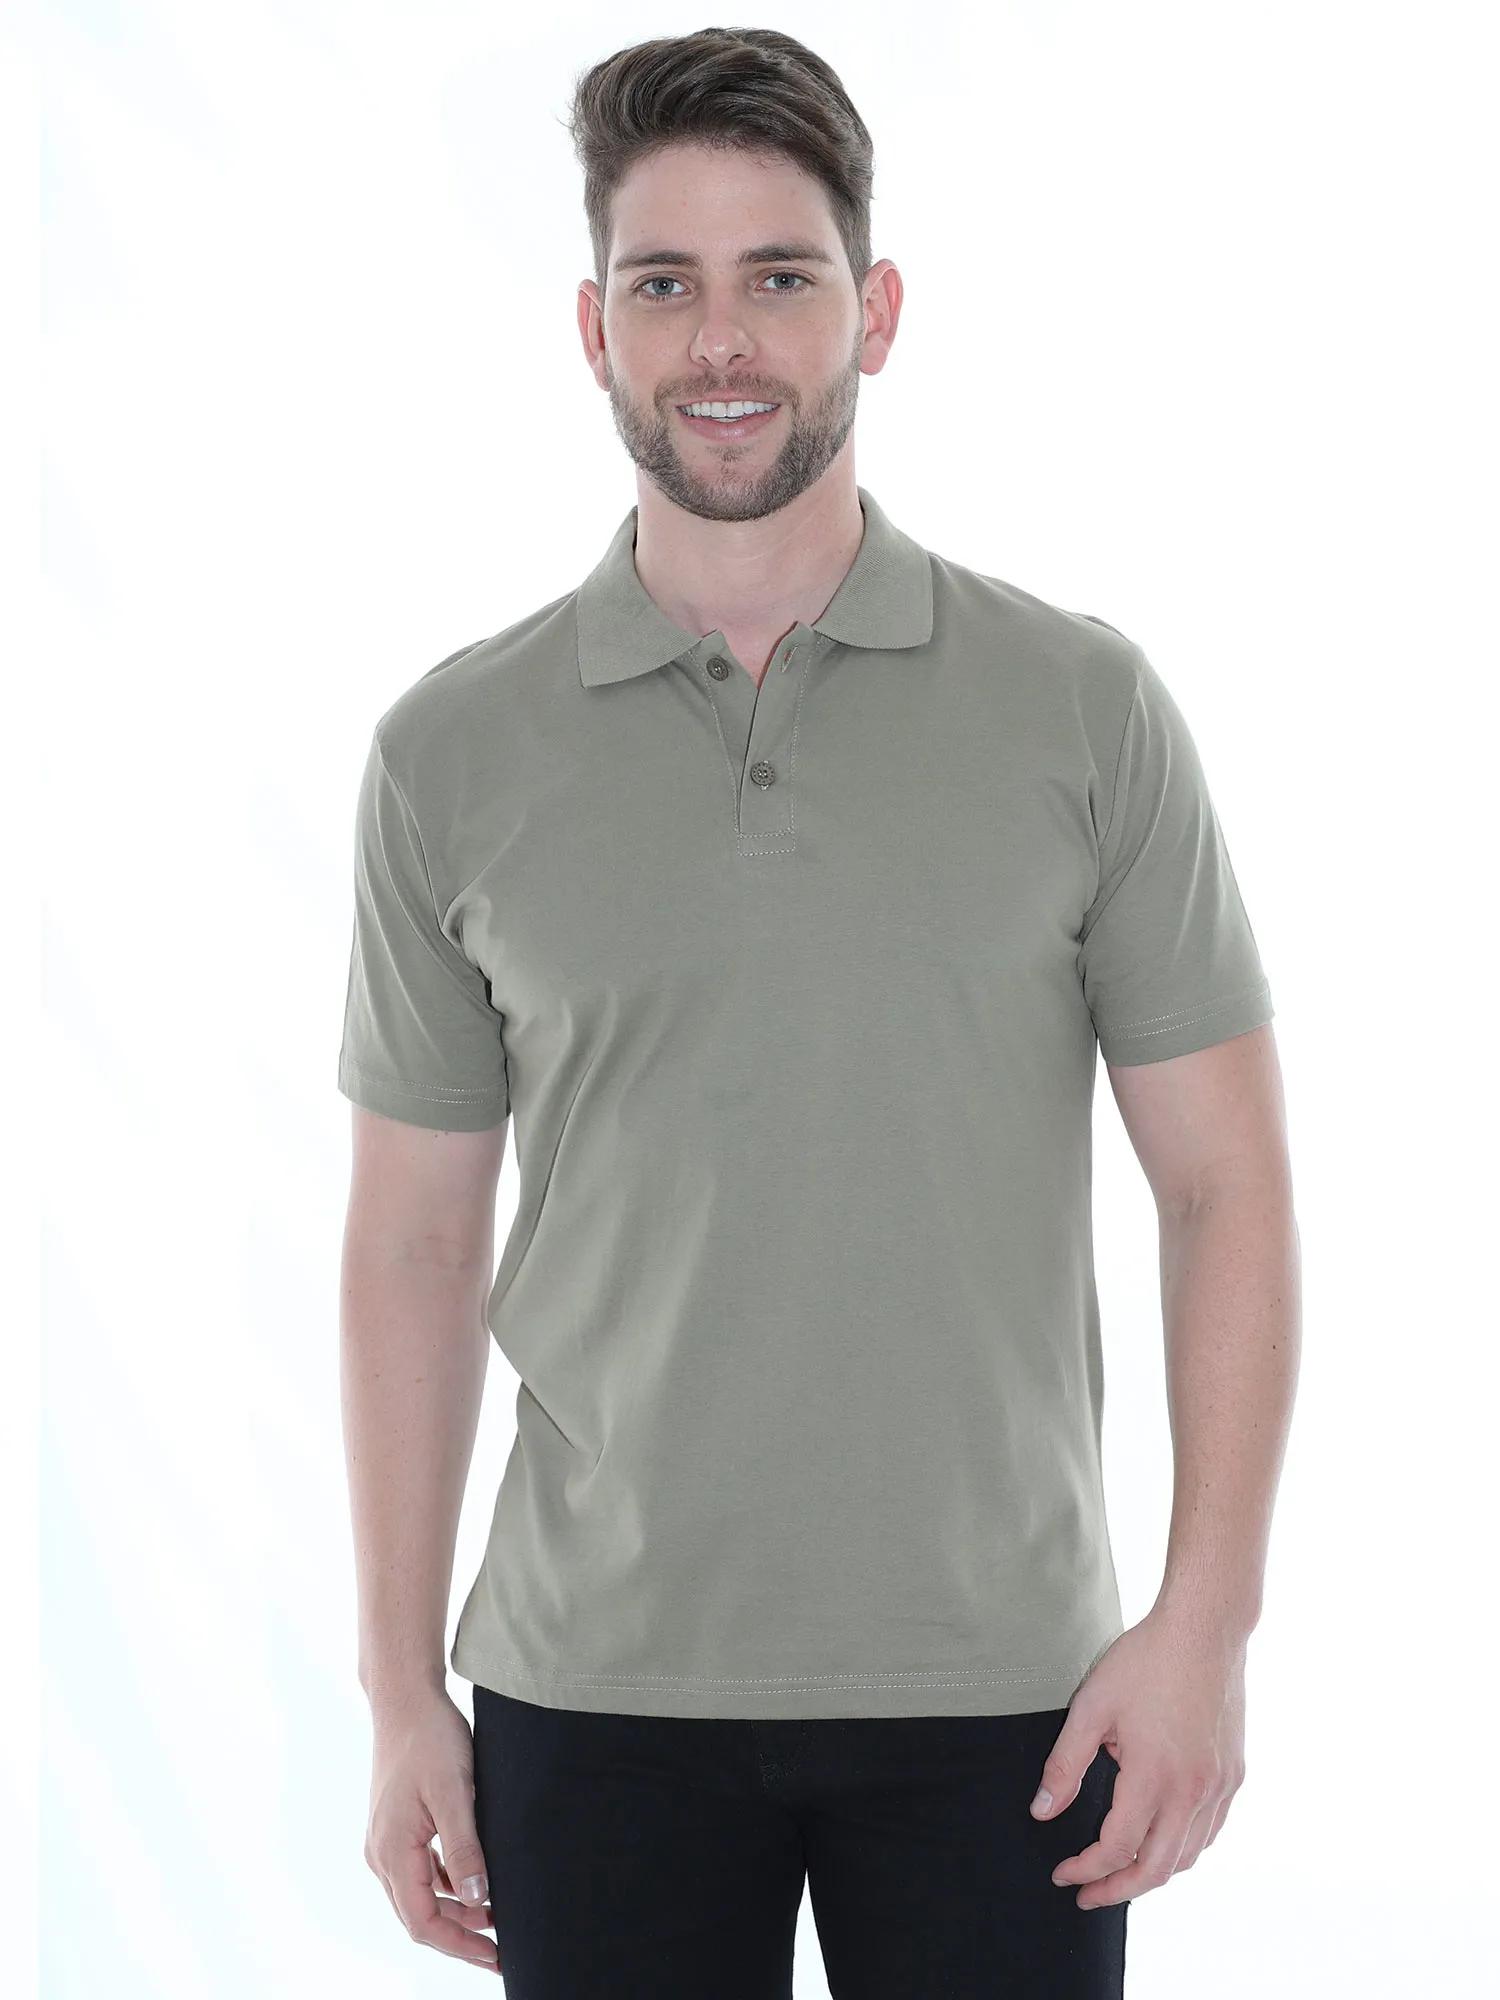 Camisa Polo Masculina Básica Algodão Lisa Conforto Bambu